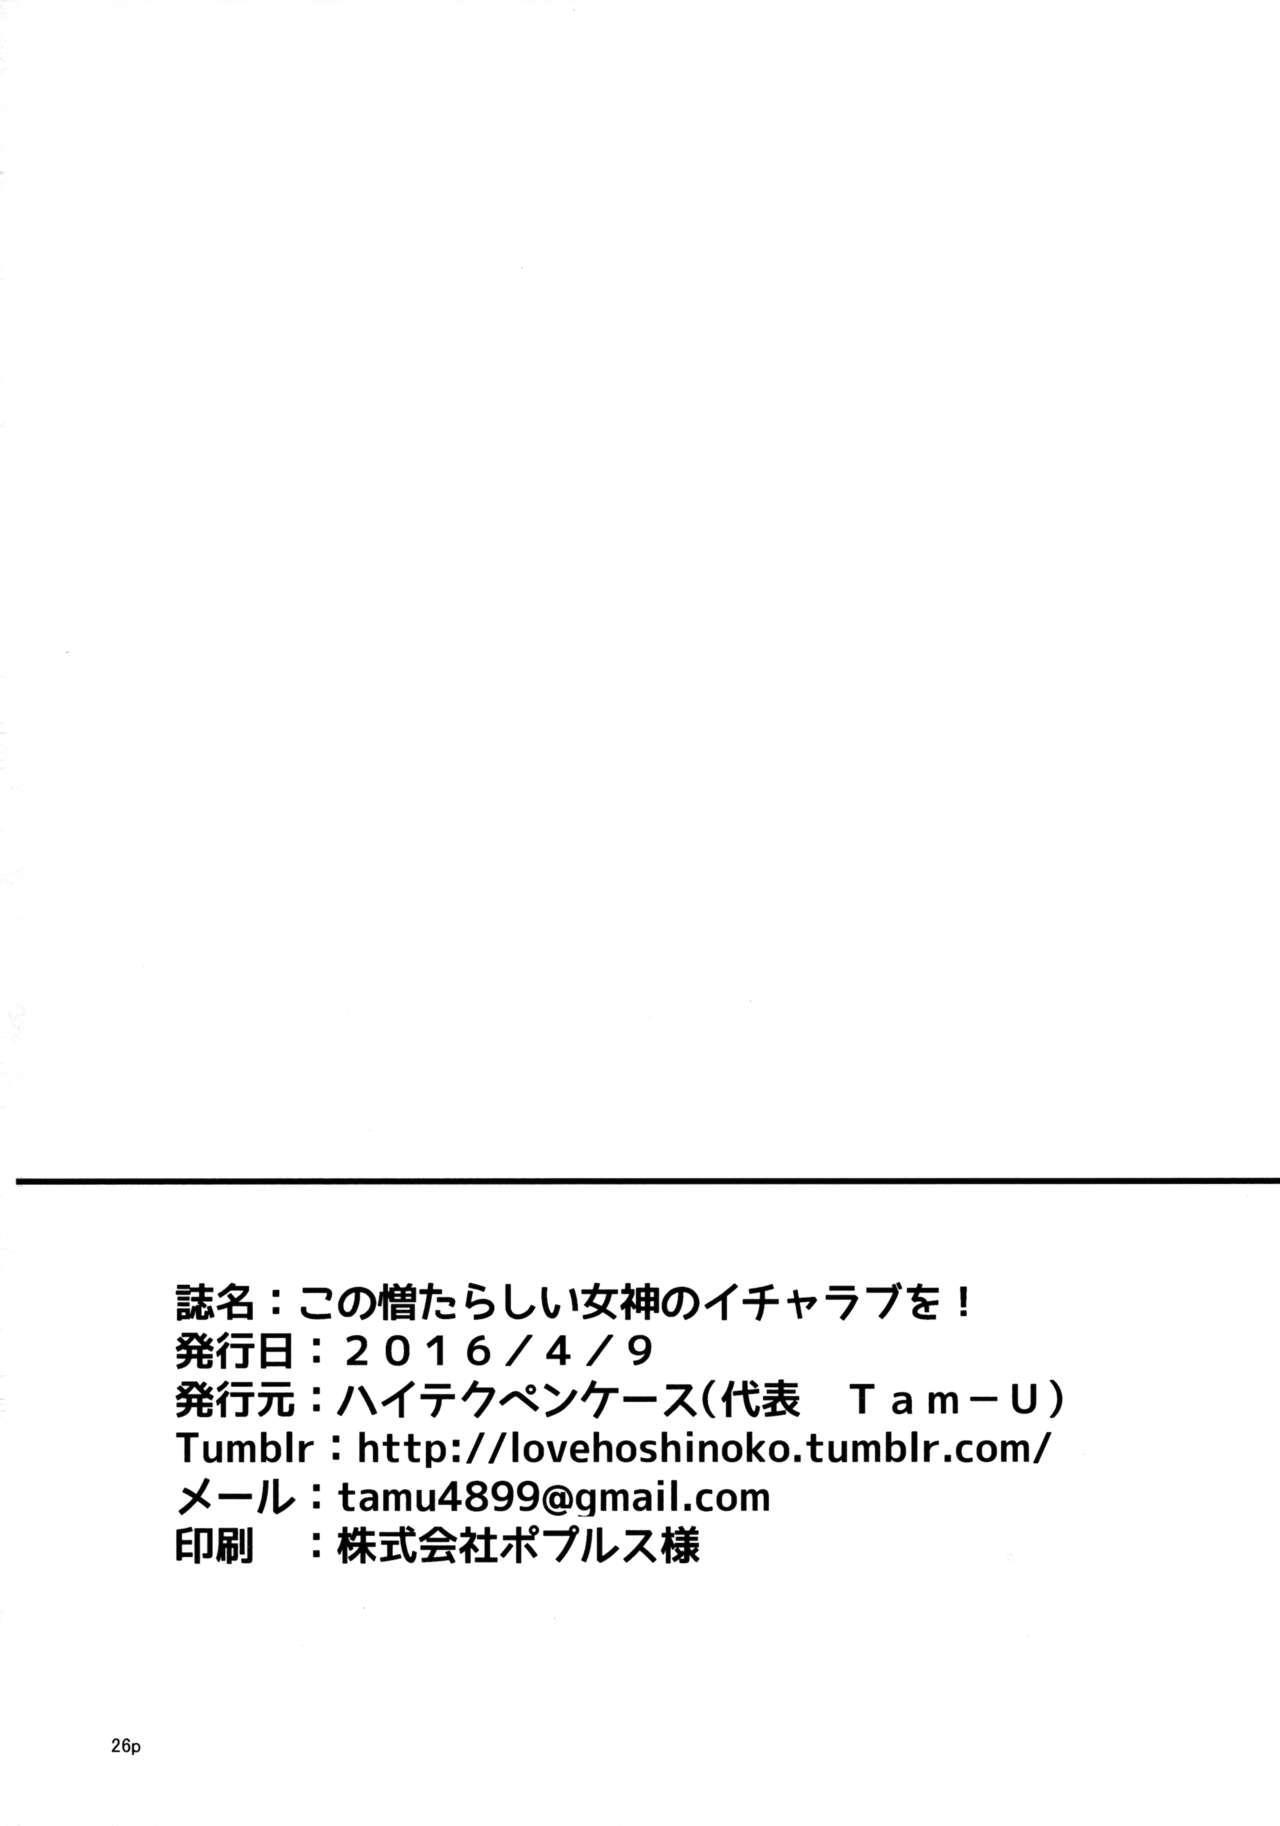 Kono Nikutarashii Megami no Icha Love o! | 為這個討厭的女神獻上卿卿我我! 25